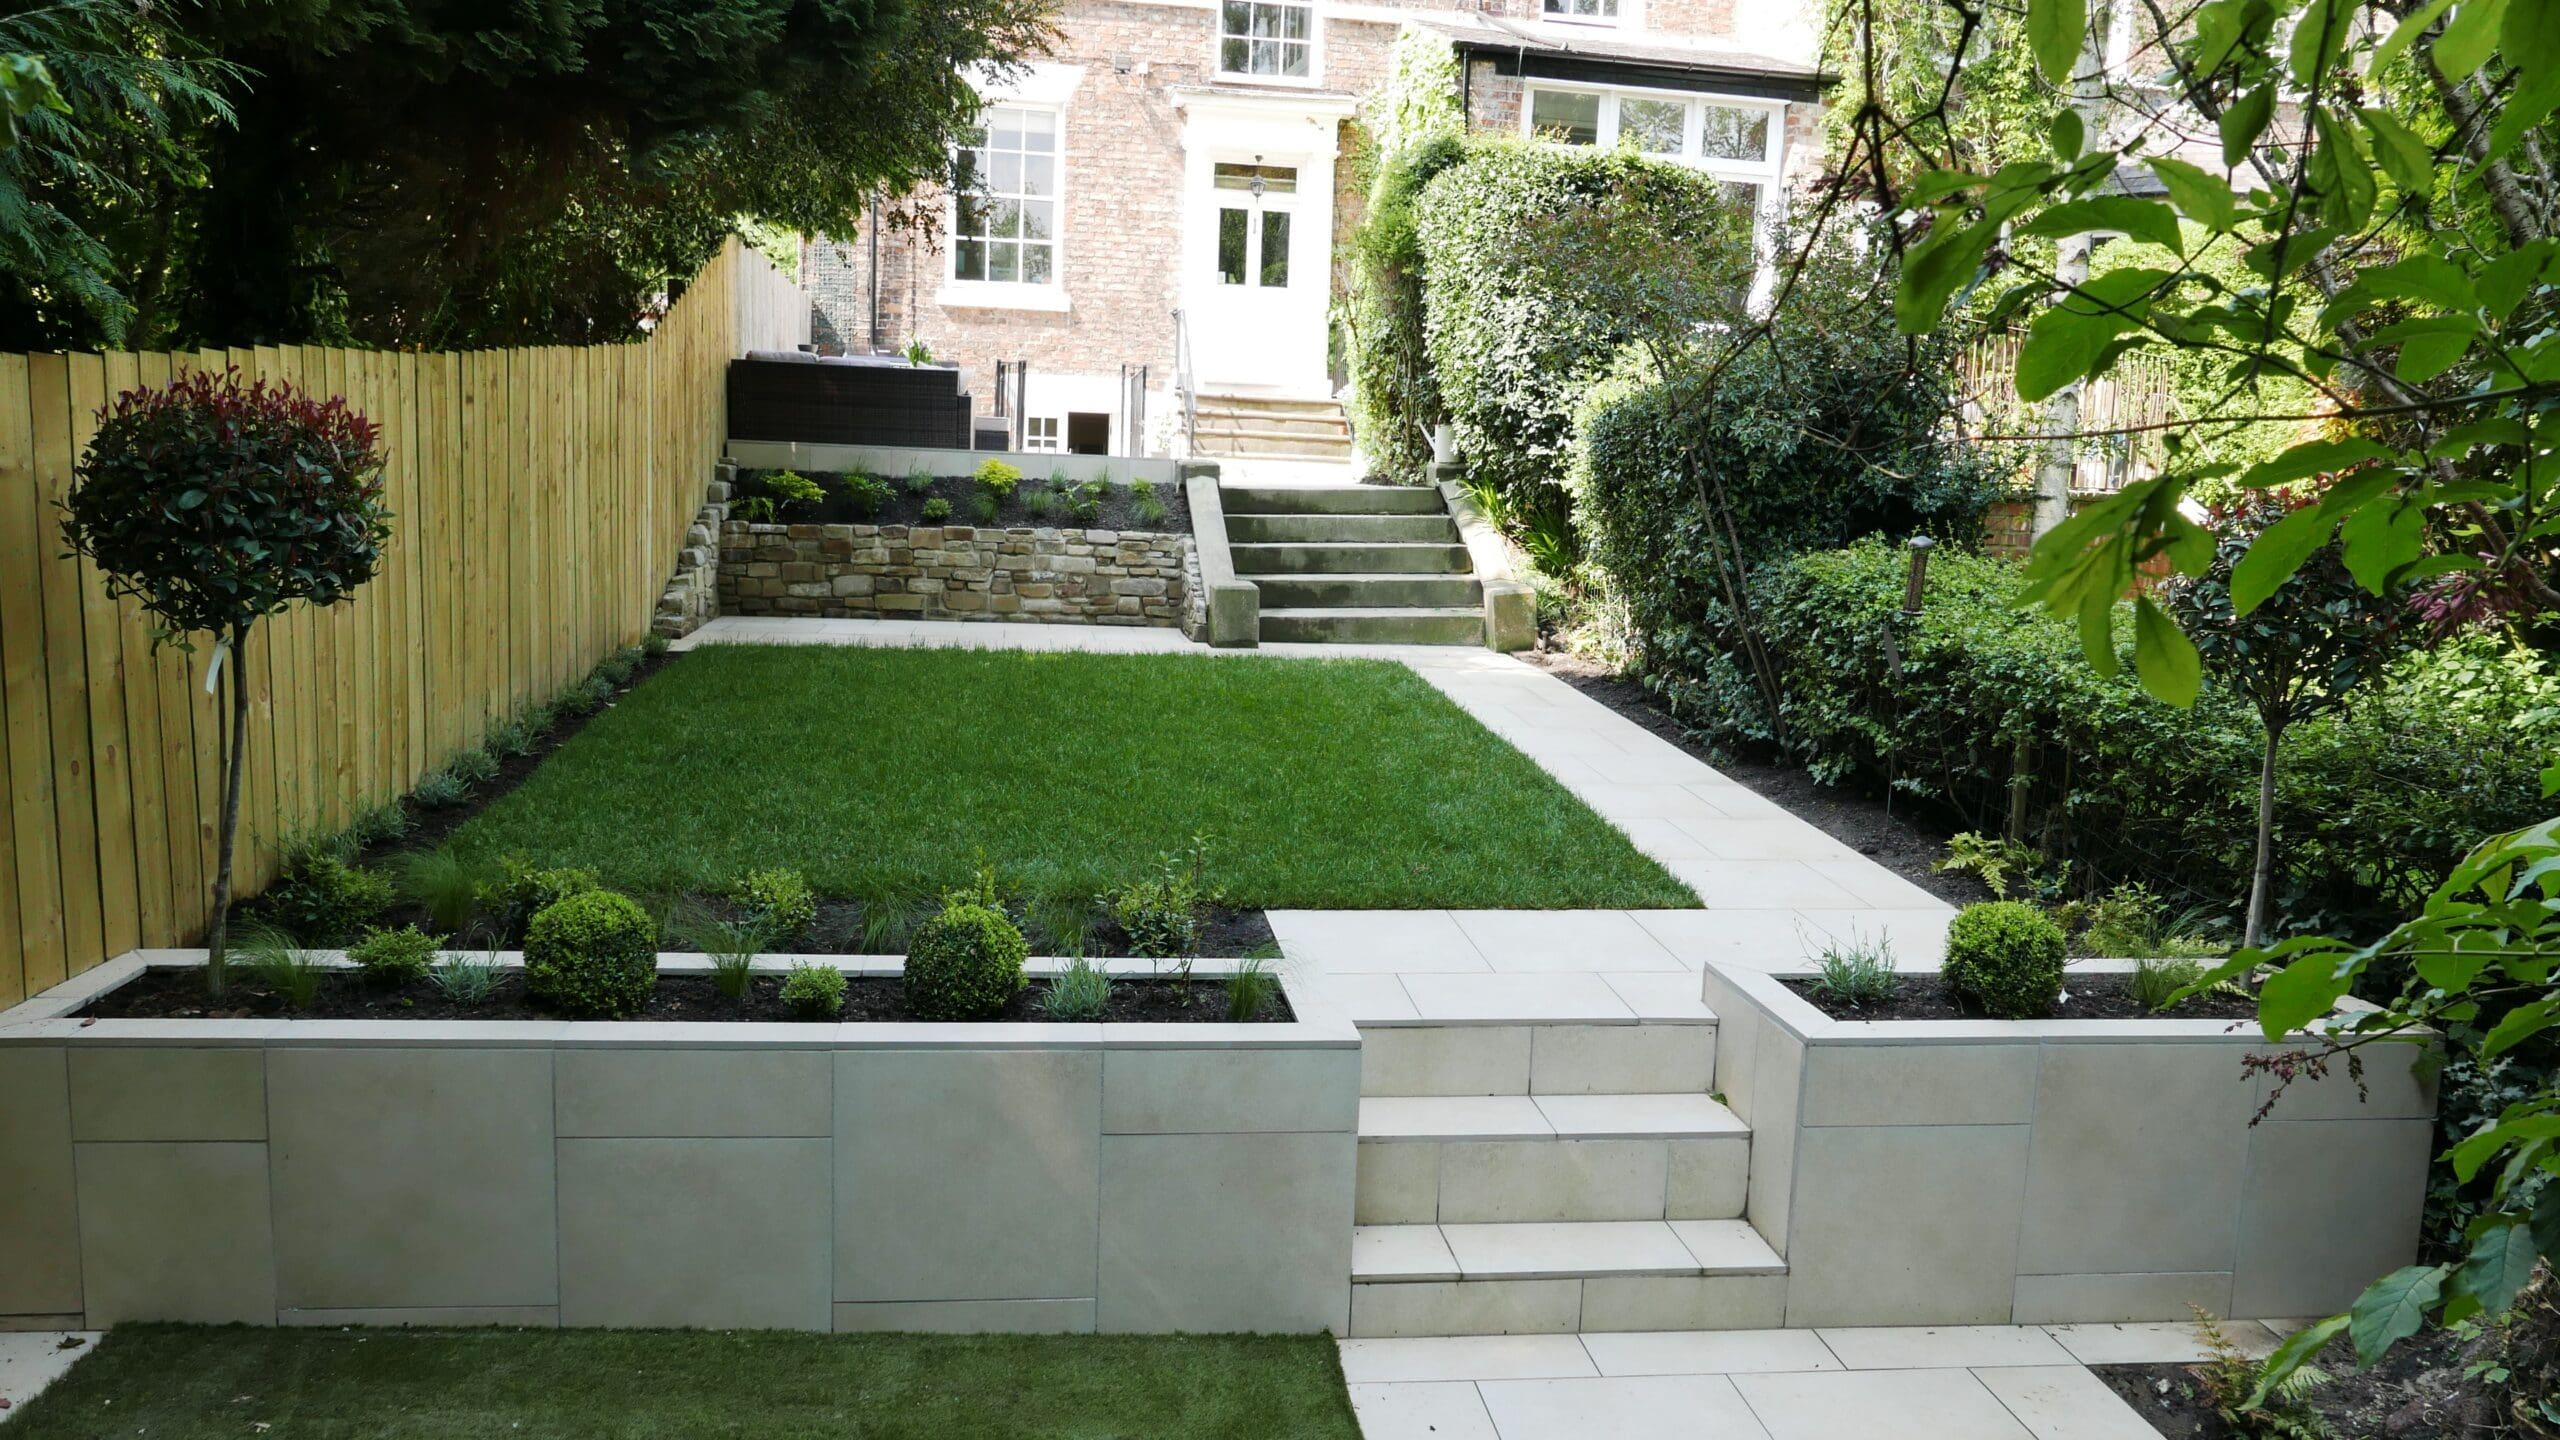 sam-nattress-gardens-projects-darlington-georgian-townhouse-landscape-design